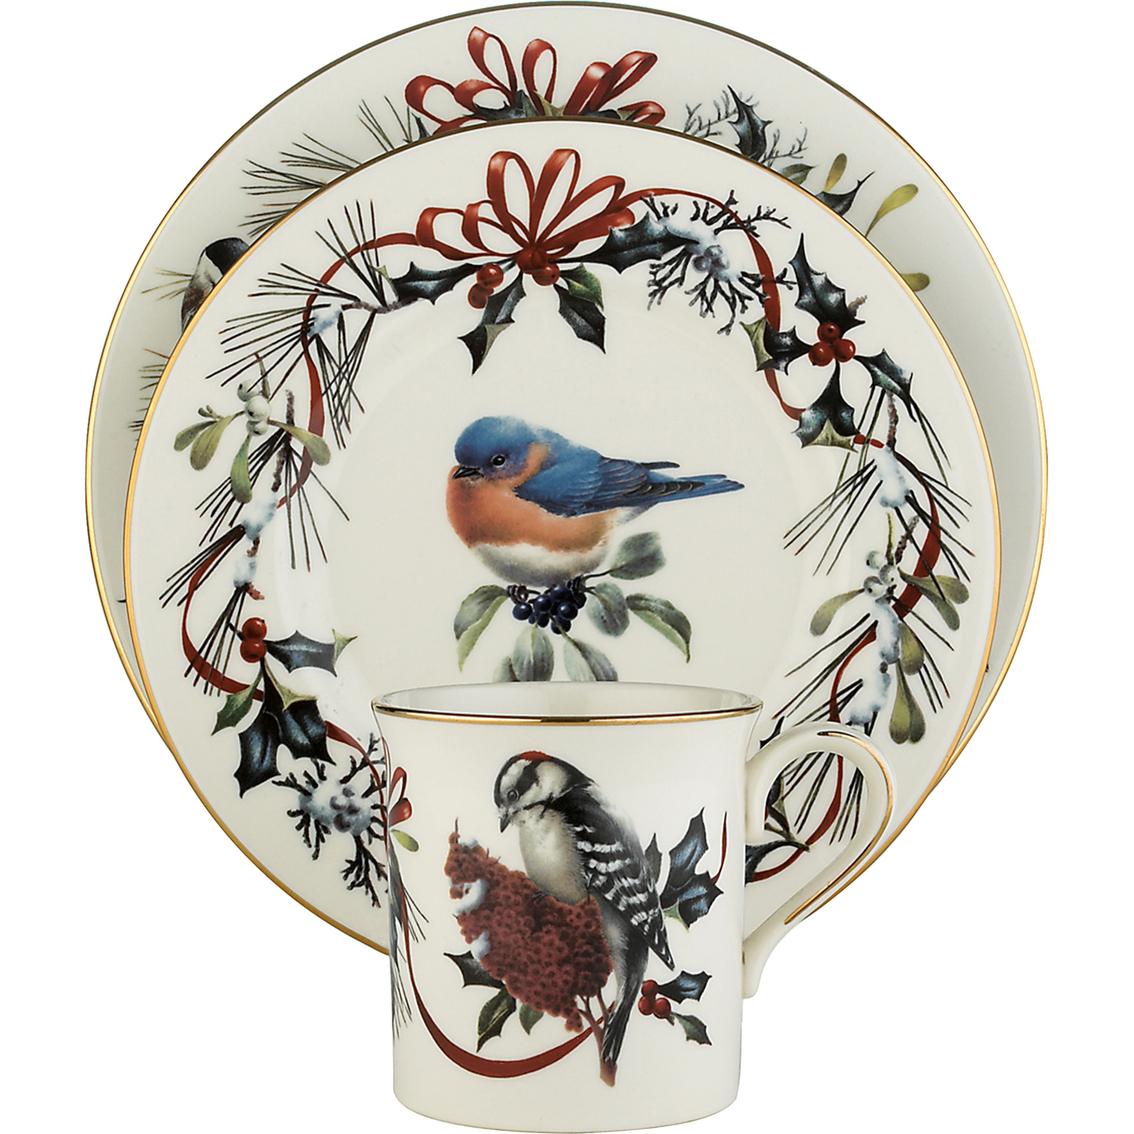 Lenox winter greetings 12 piece set dinnerware sets home lenox winter greetings 12 piece set m4hsunfo